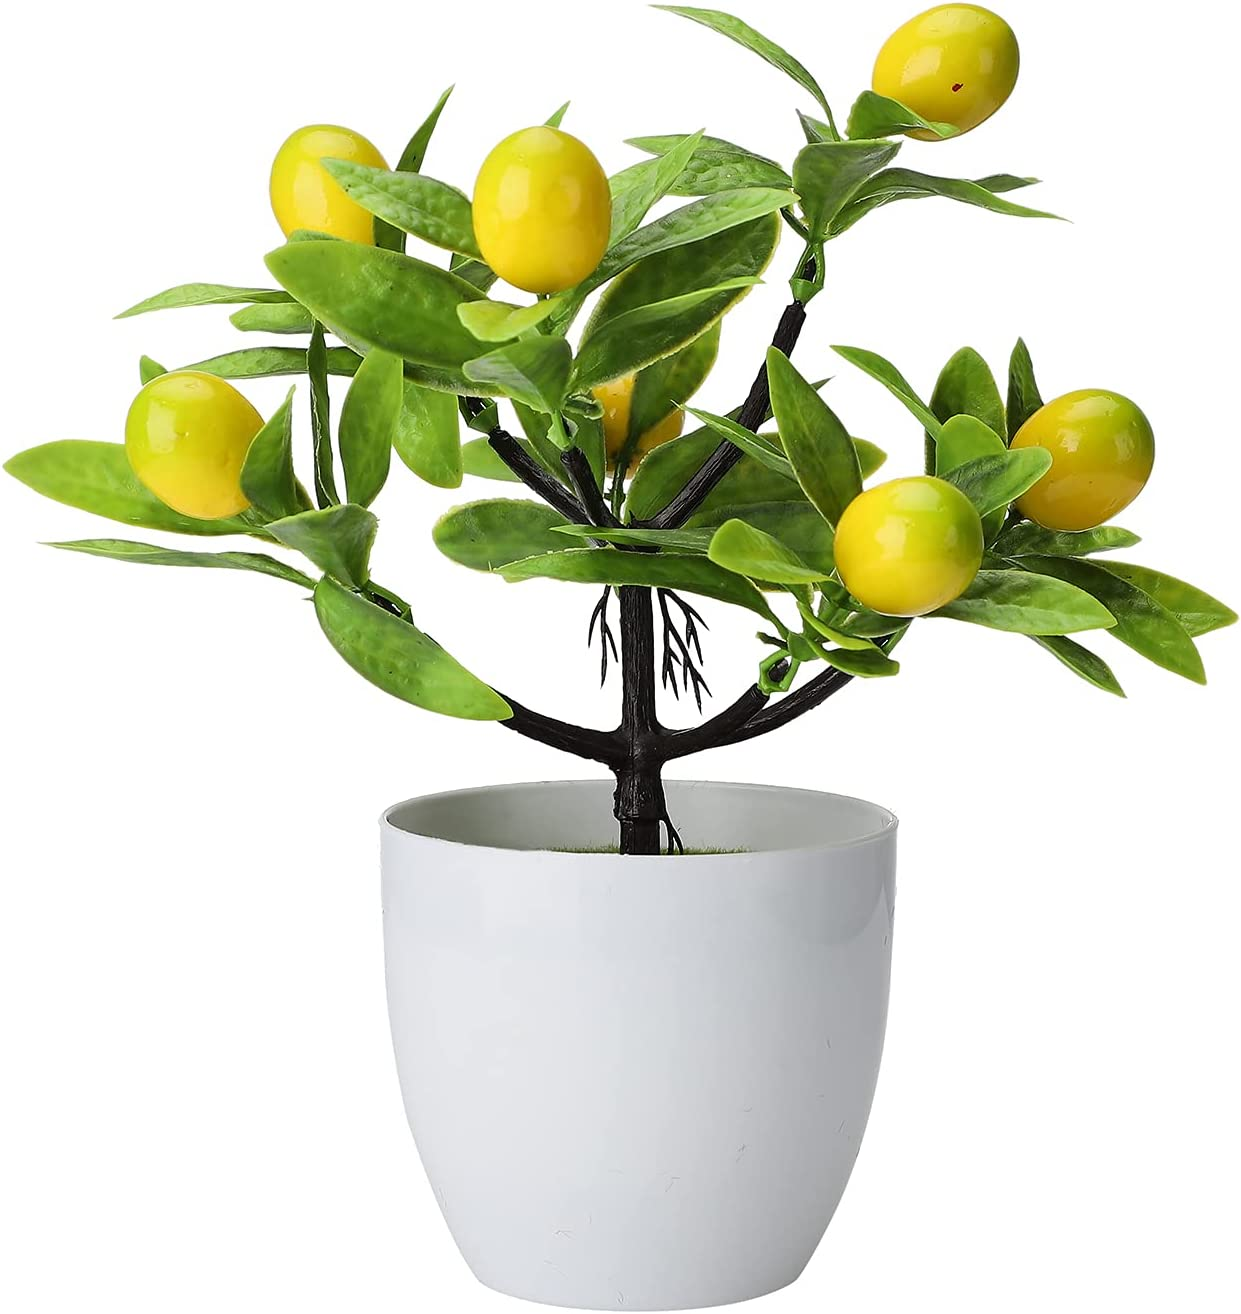 2Pcs Mini Artificial Lemon Tree online shopping Fake Potted Bonsai Yellow Plant Max 57% OFF